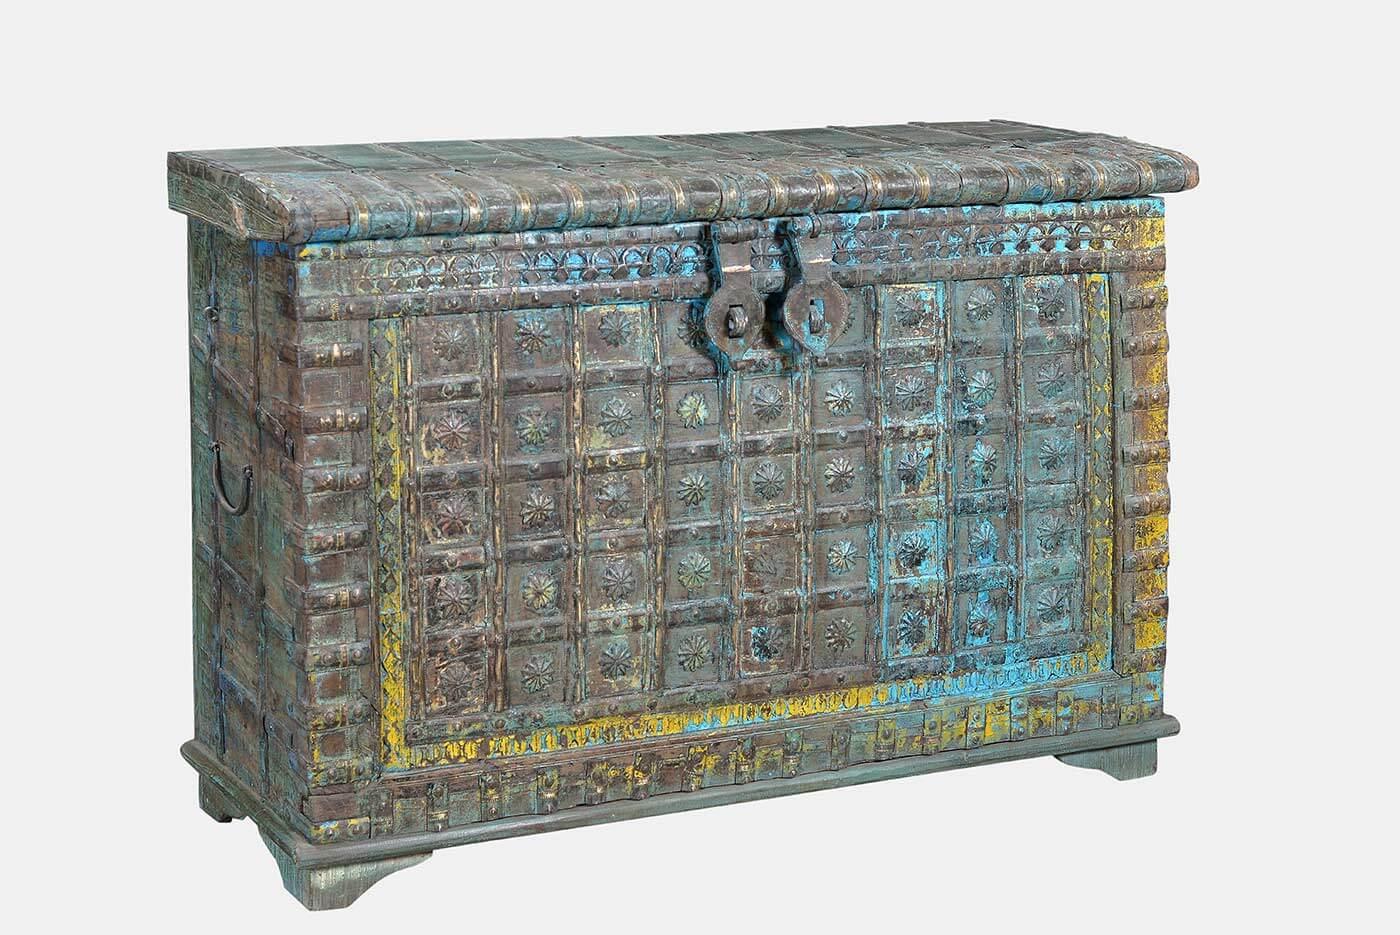 oude-kist-kast-uit-india-oosterse-meubelen-indiase-meubels-bruin-vintage-natural-koreman-maastricht